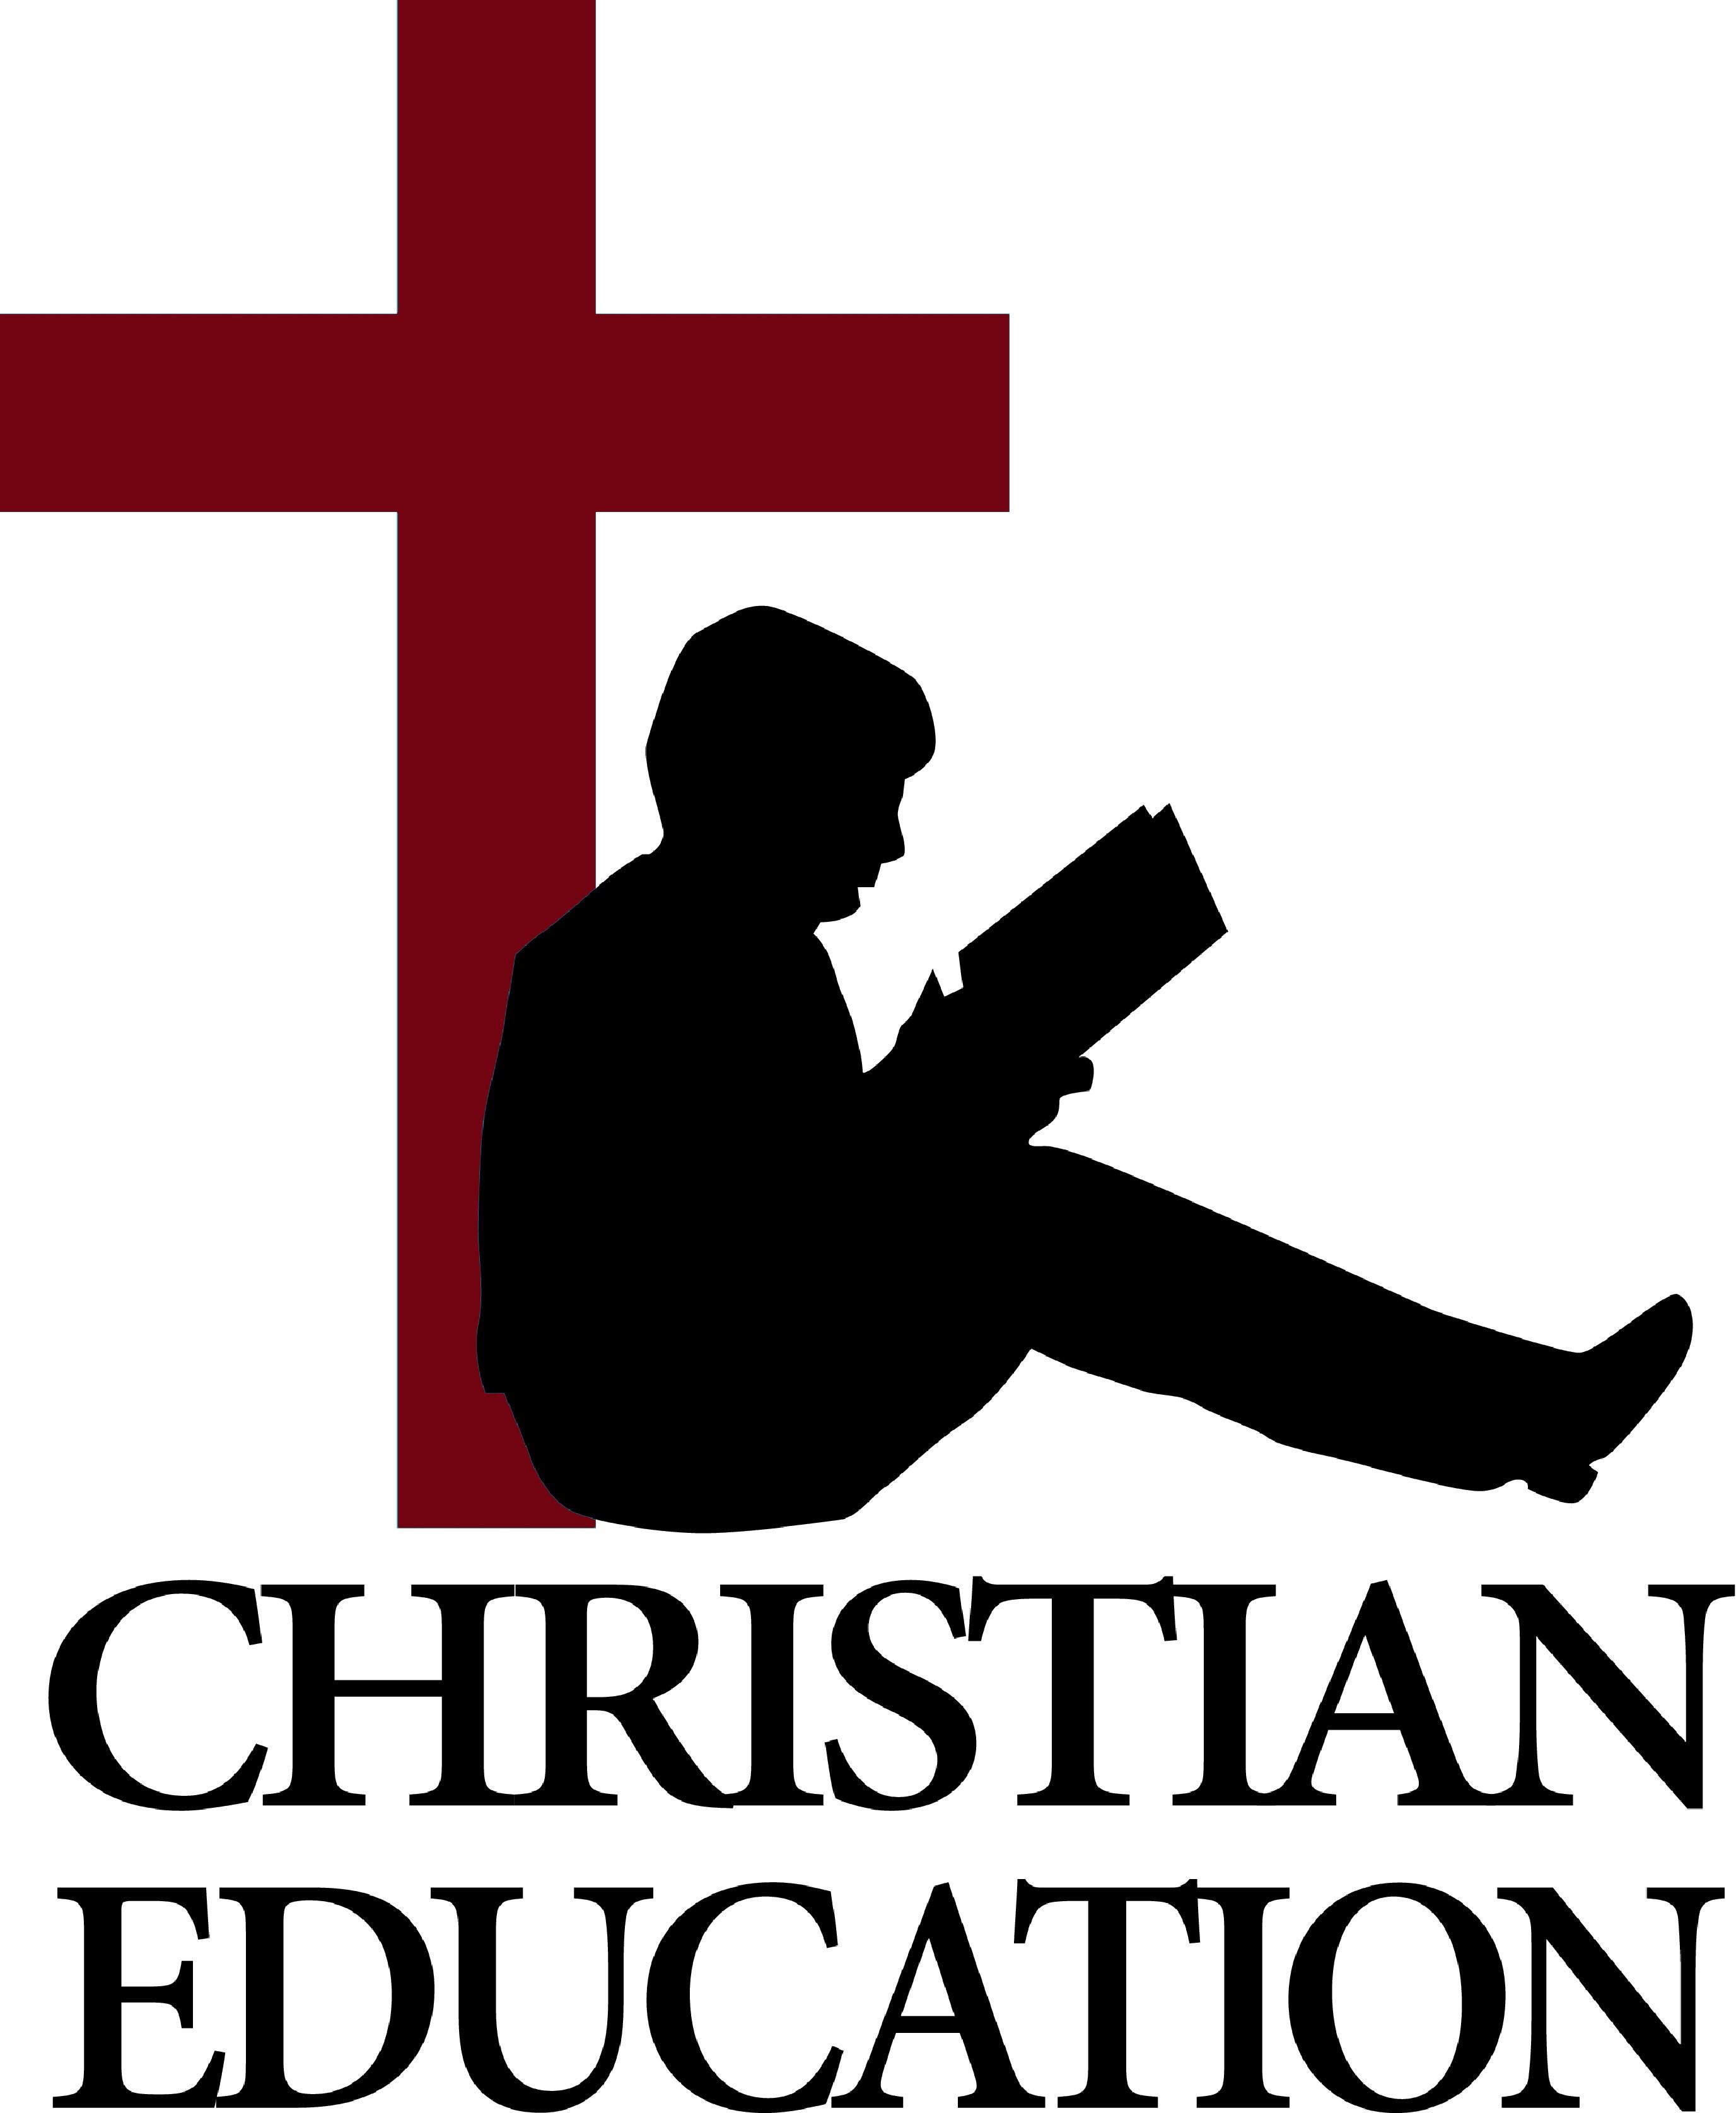 Christian living education clipart 4 » Clipart Portal.